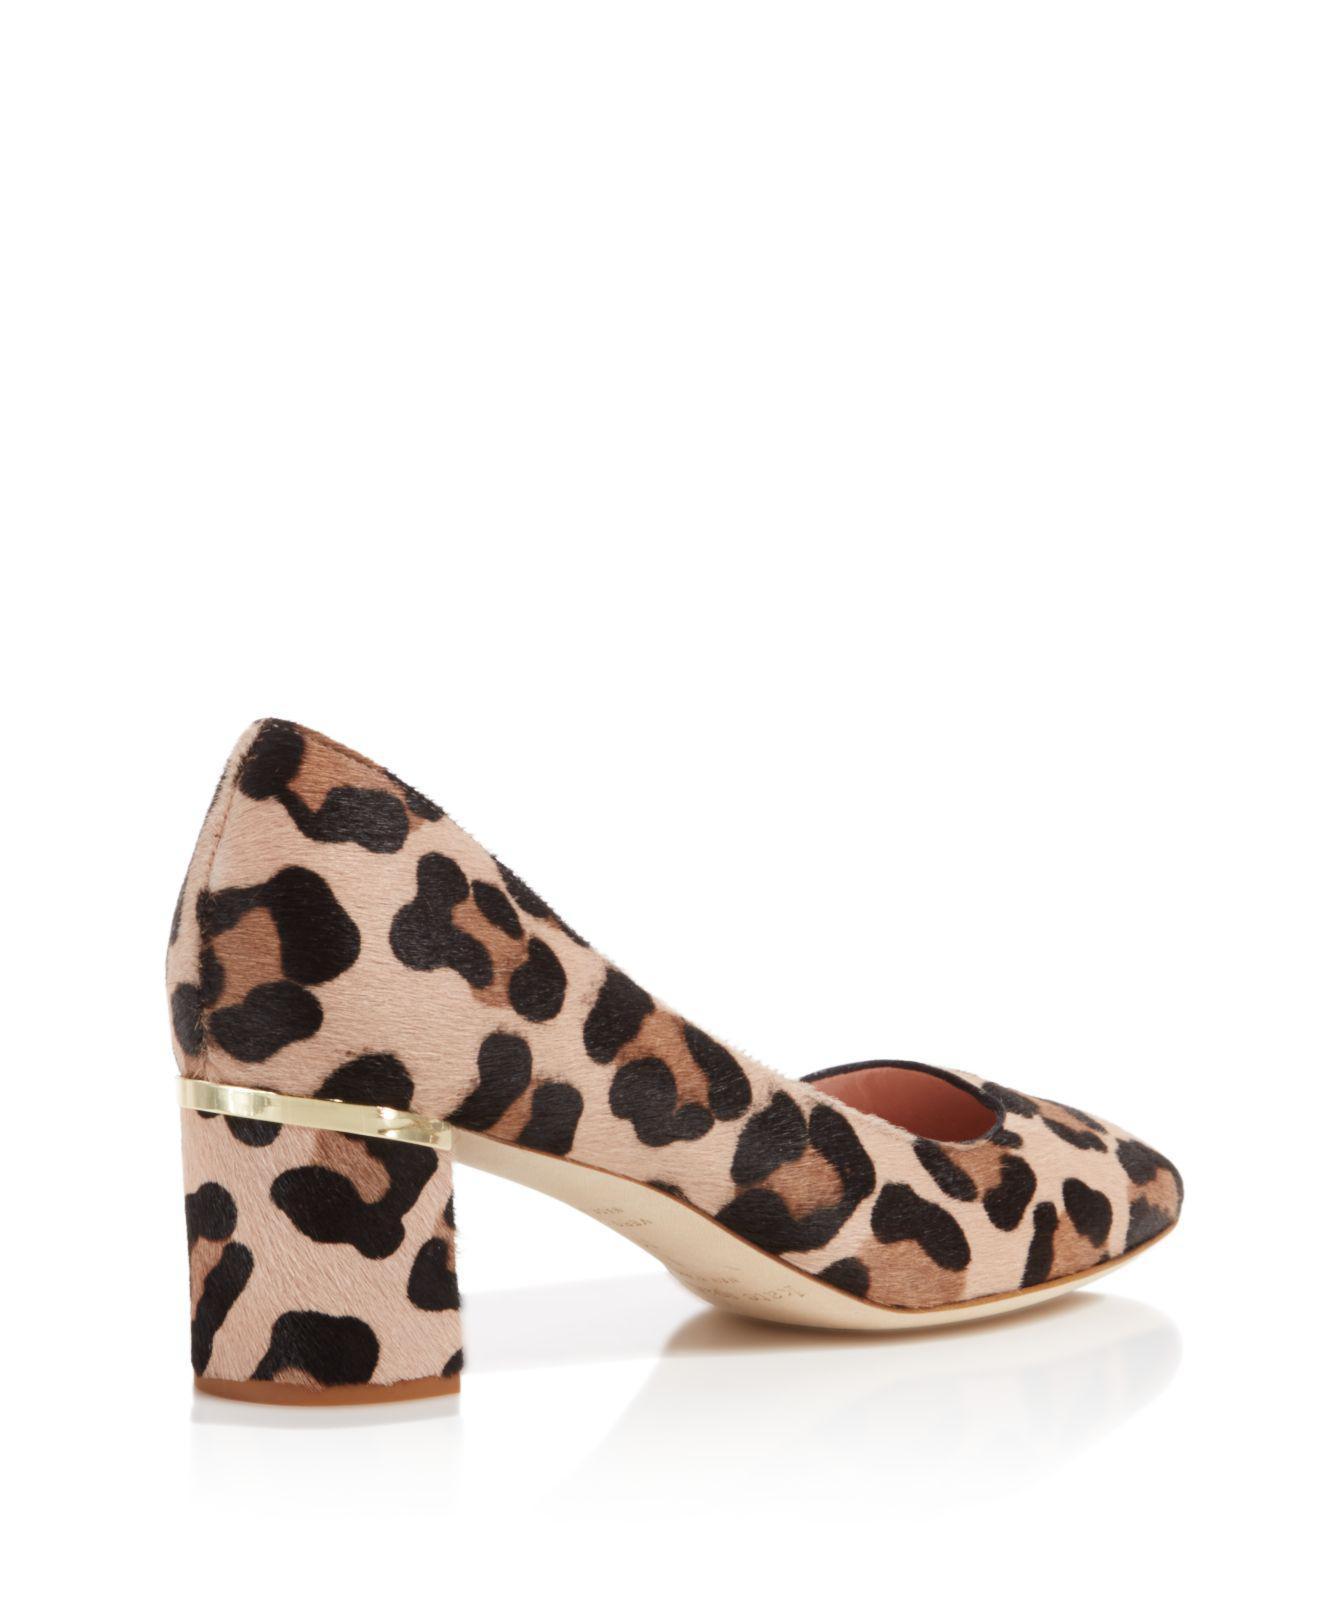 6aaca44cdfef Lyst - Kate Spade Dolores Too Leopard Print Calf Hair Pumps in Brown